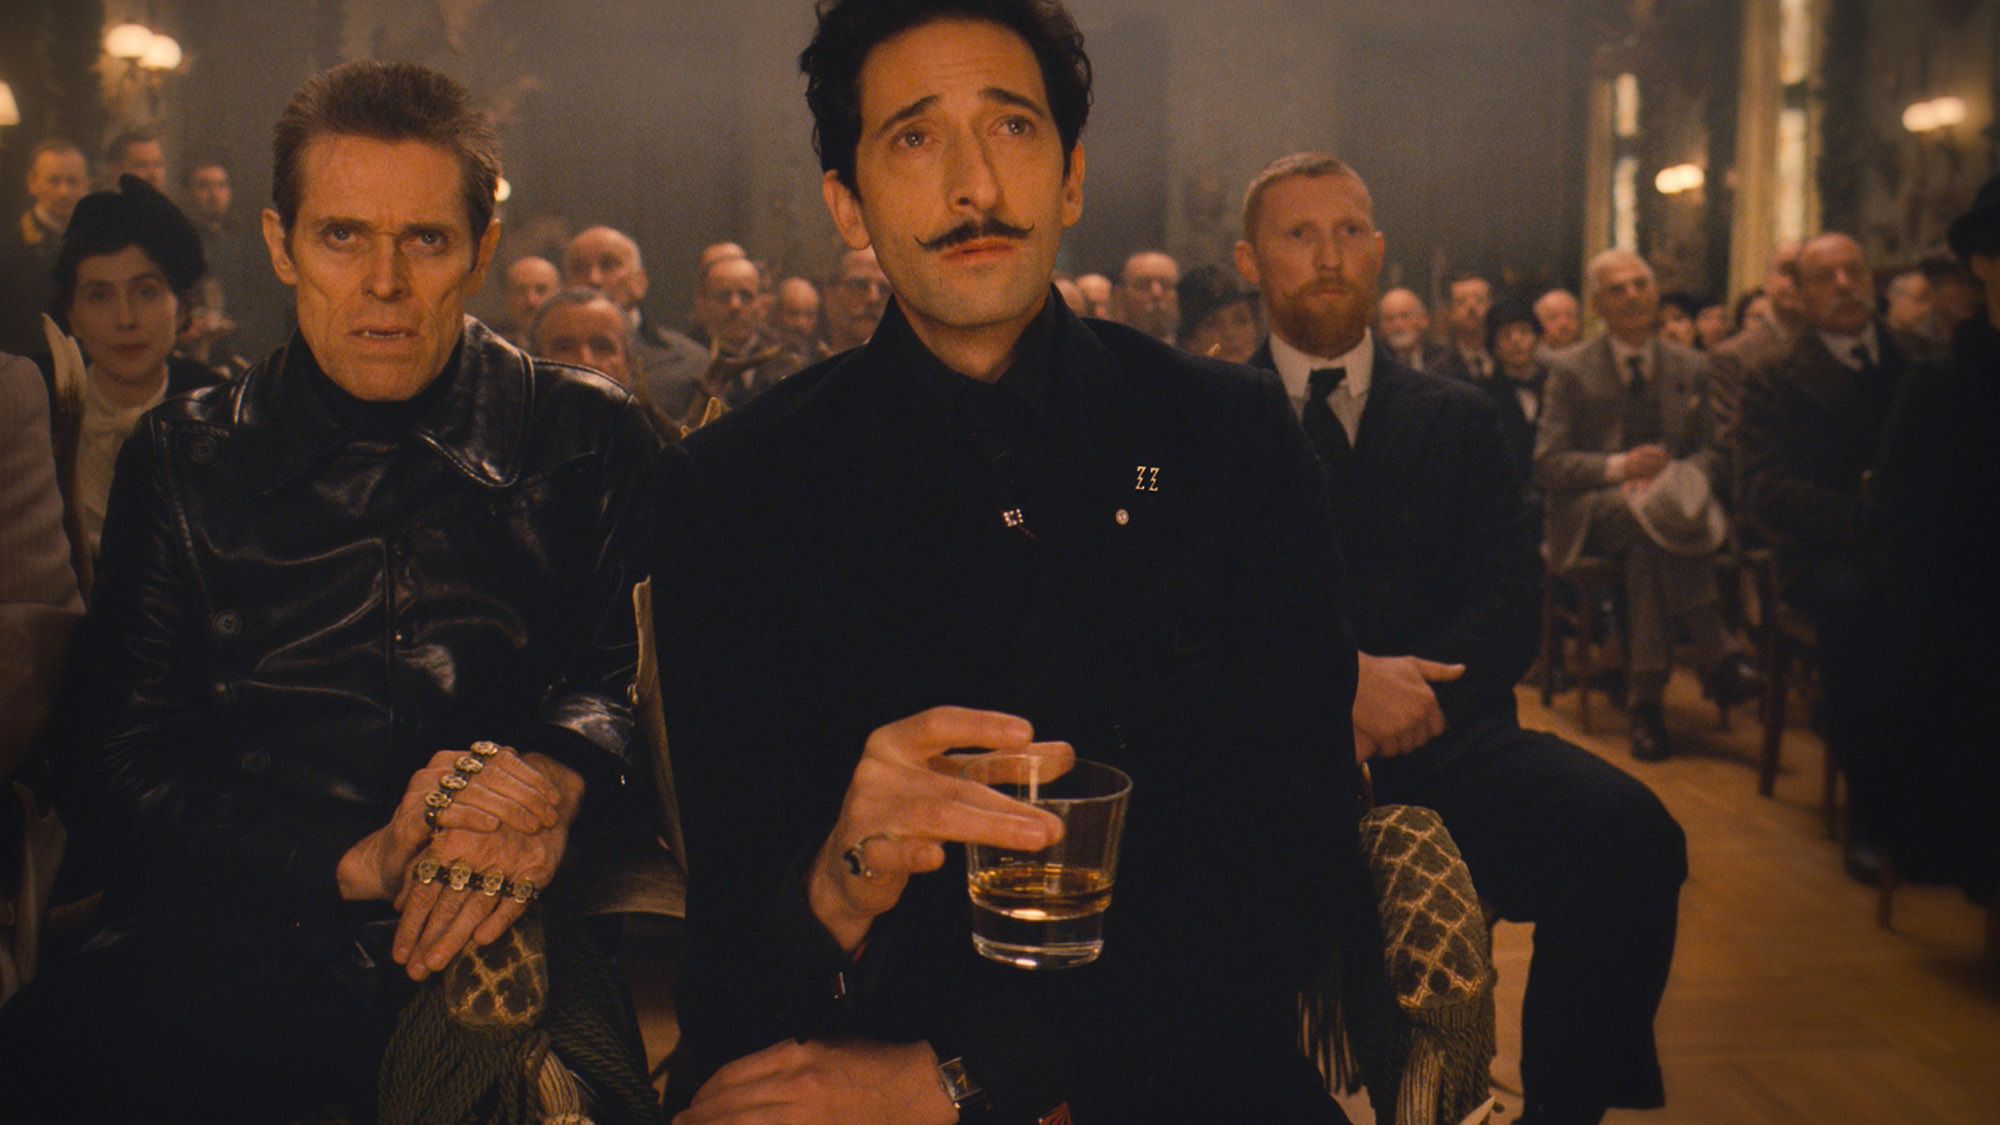 'The Grand Budapest Hotel' en 'The Imitation Game' winnen bij Writers Guild Awards